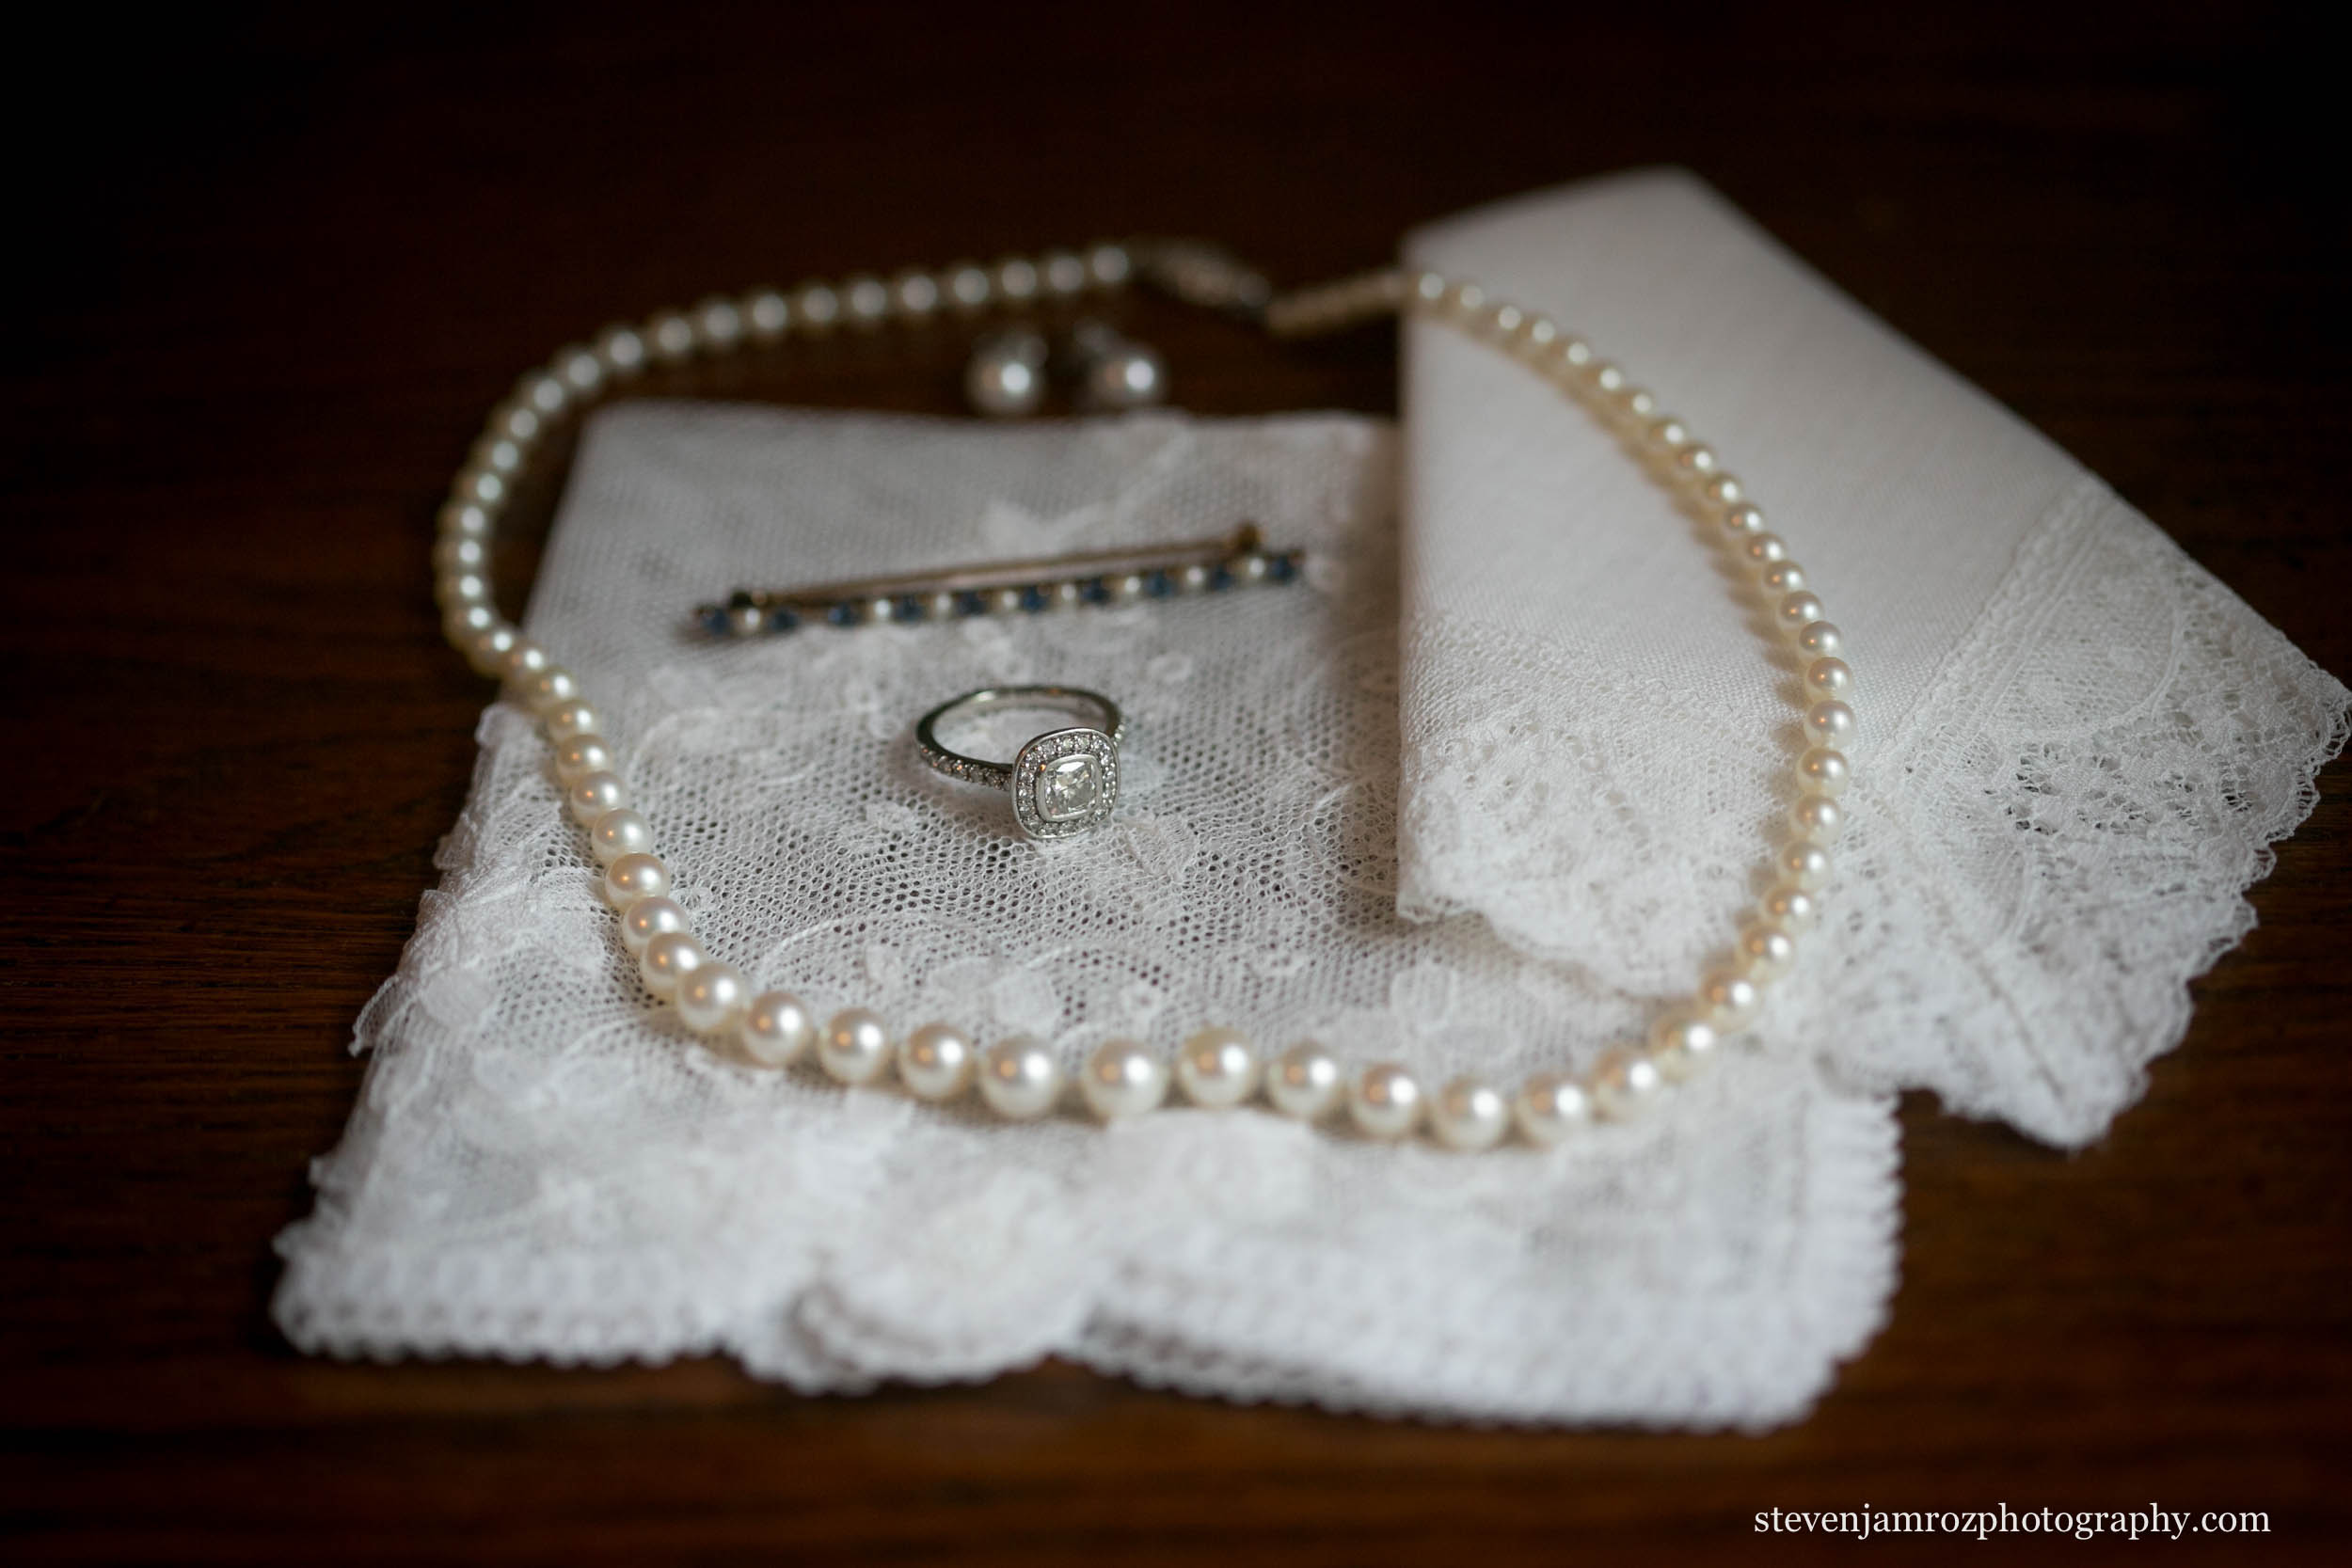 necklace-ring-hankerchief-wedding-photographer-steven-jamroz-0732.jpg